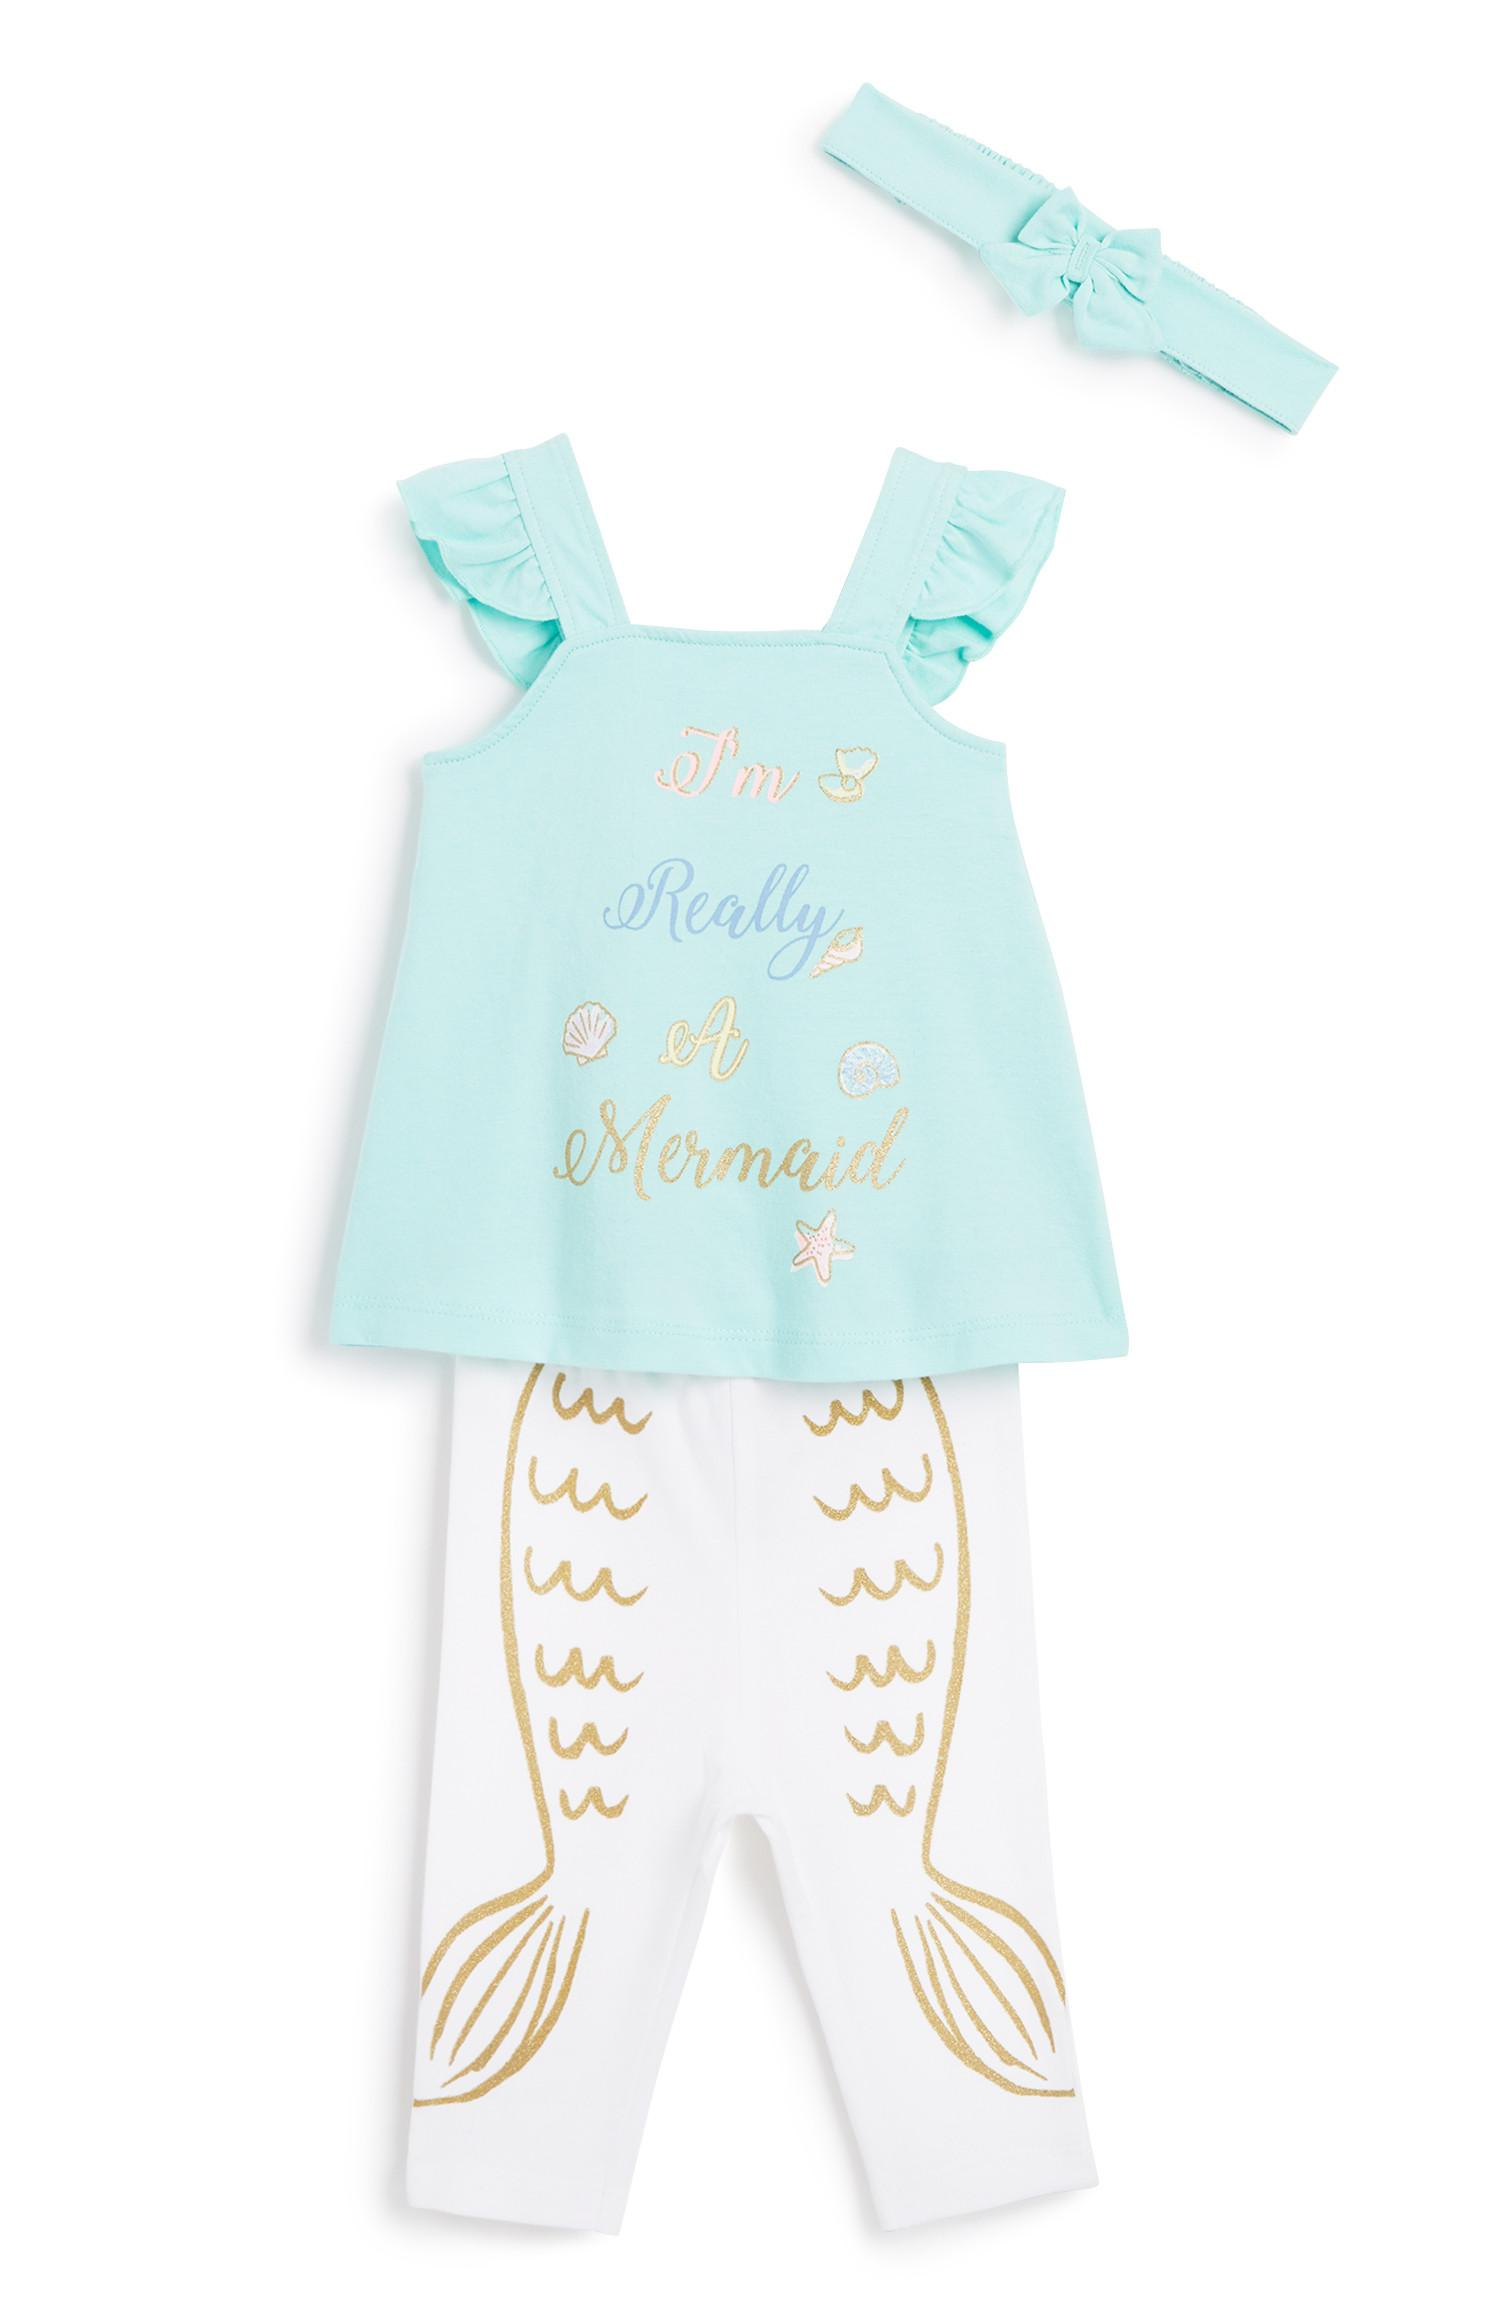 3-teiliges Outfit für Babys (M)